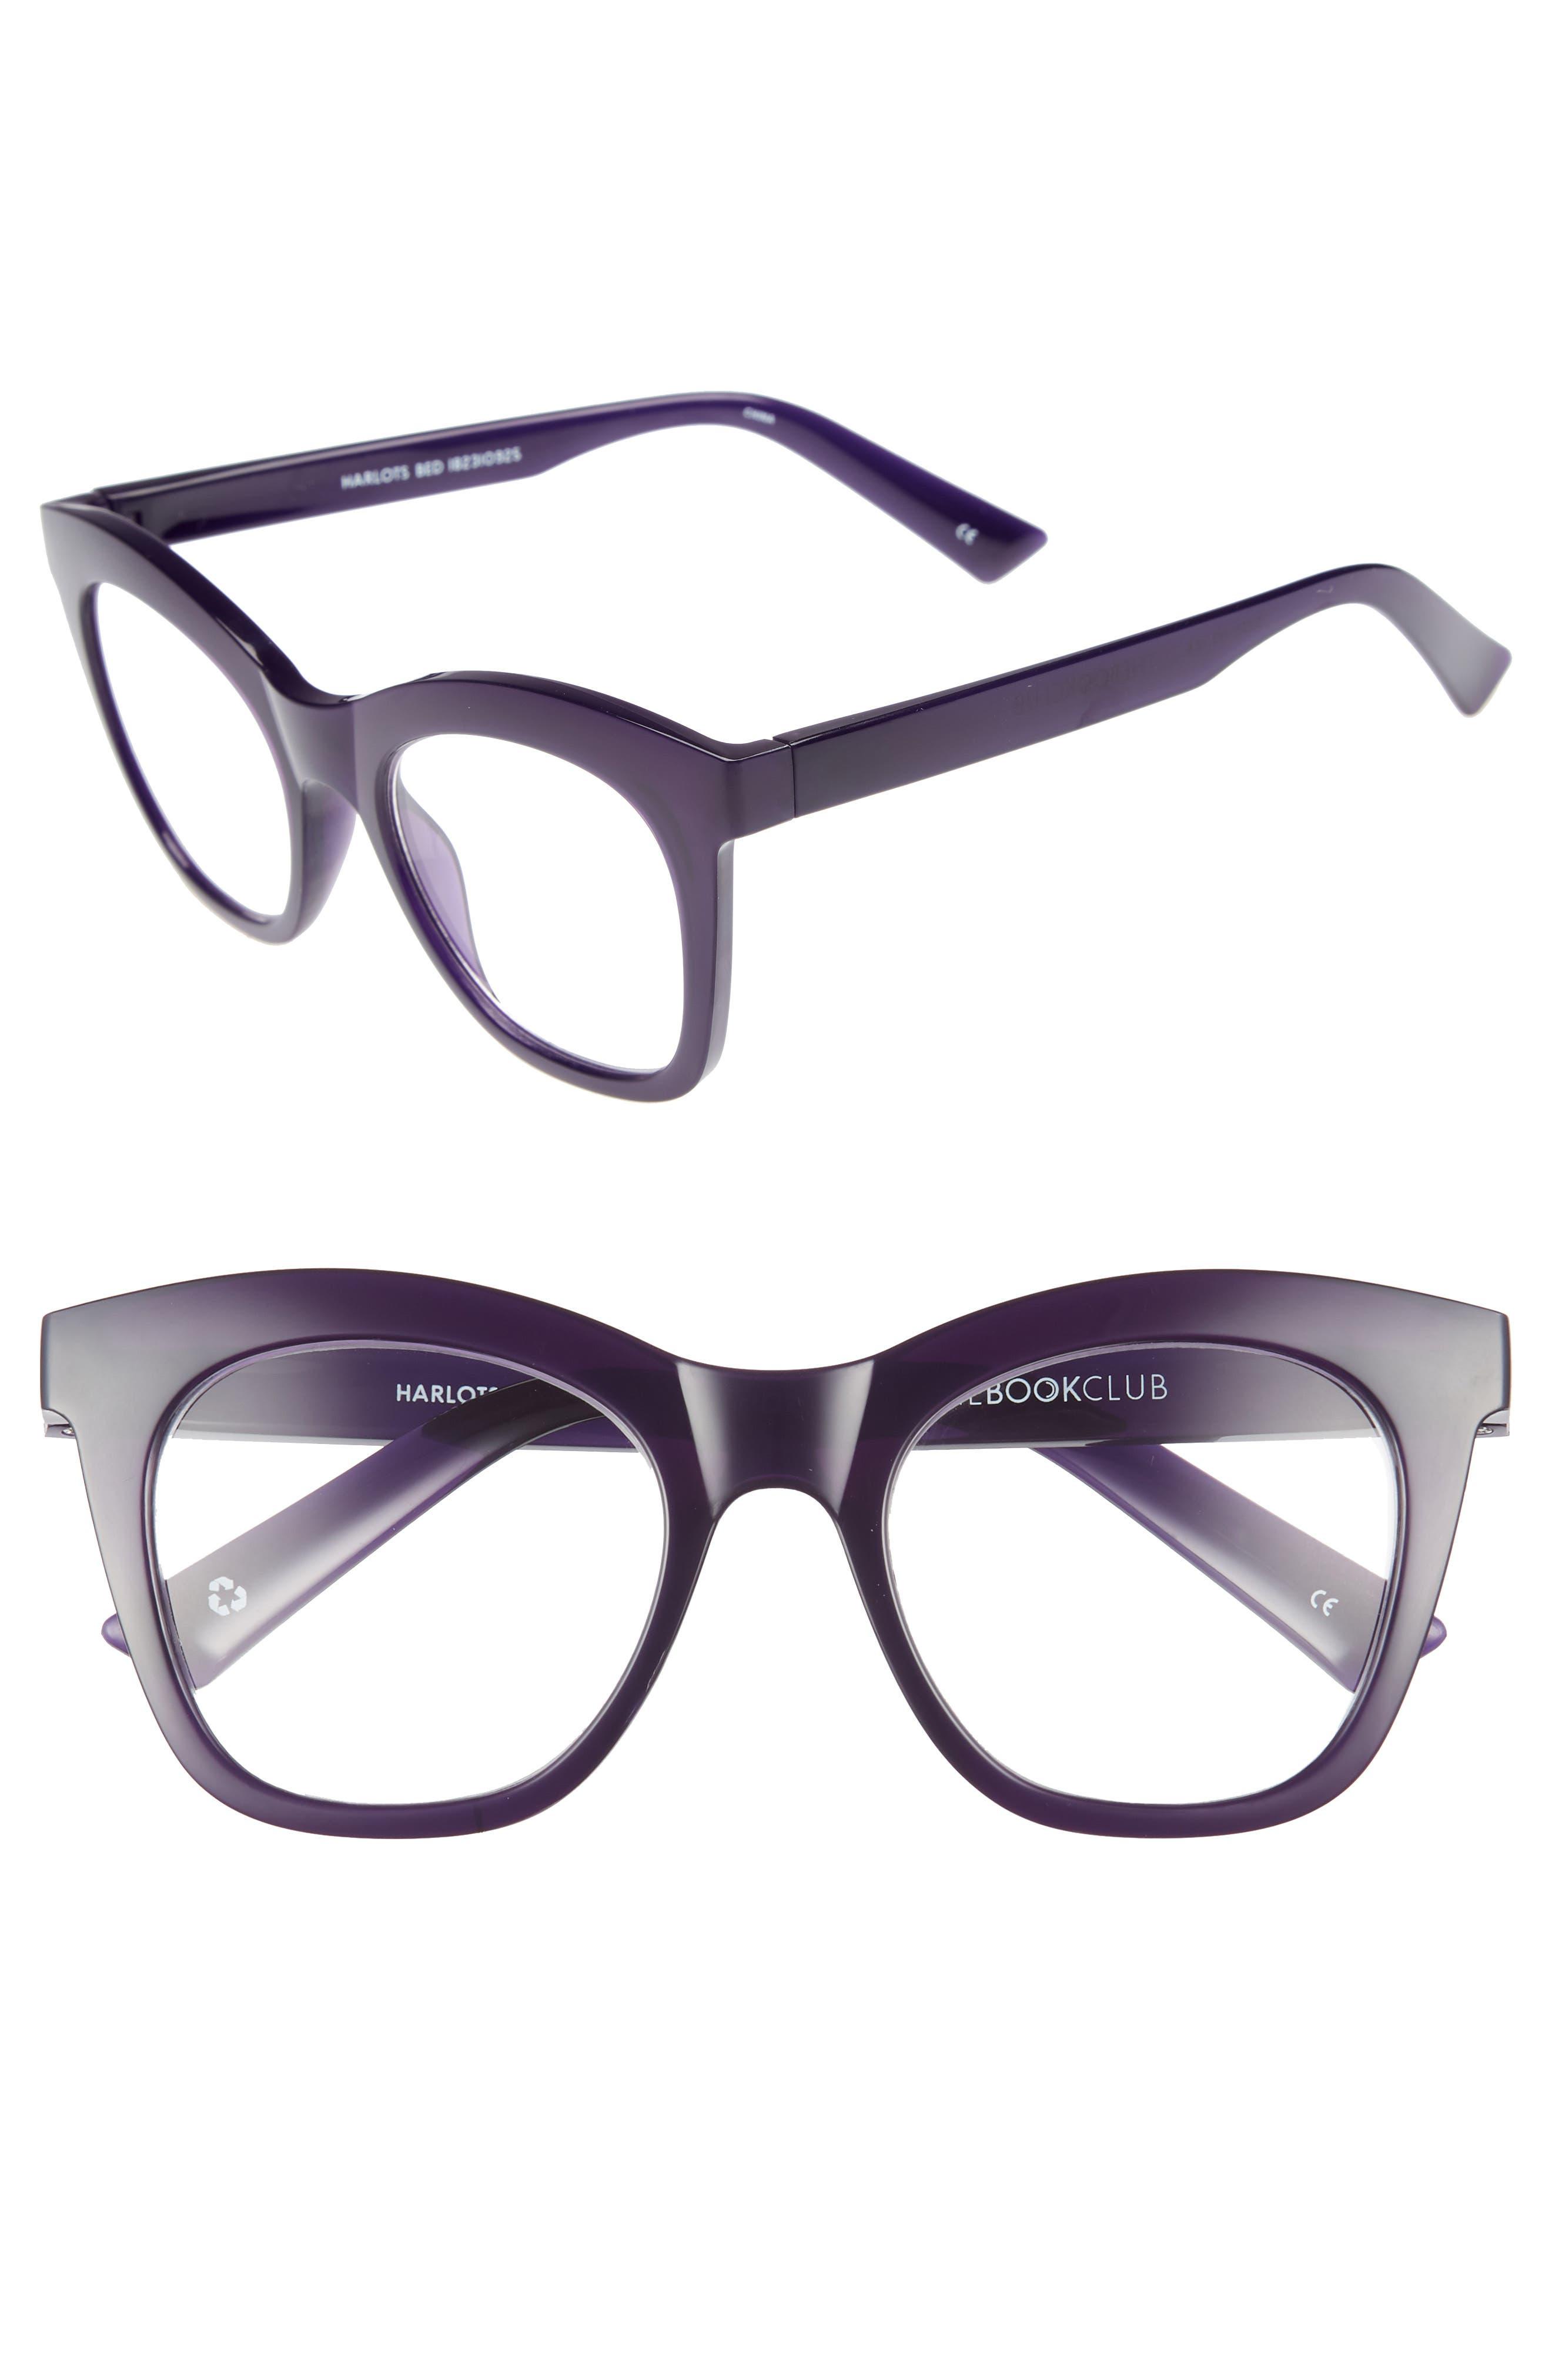 Harlot's Bed 51mm Reading Glasses,                             Main thumbnail 1, color,                             Deep Purple